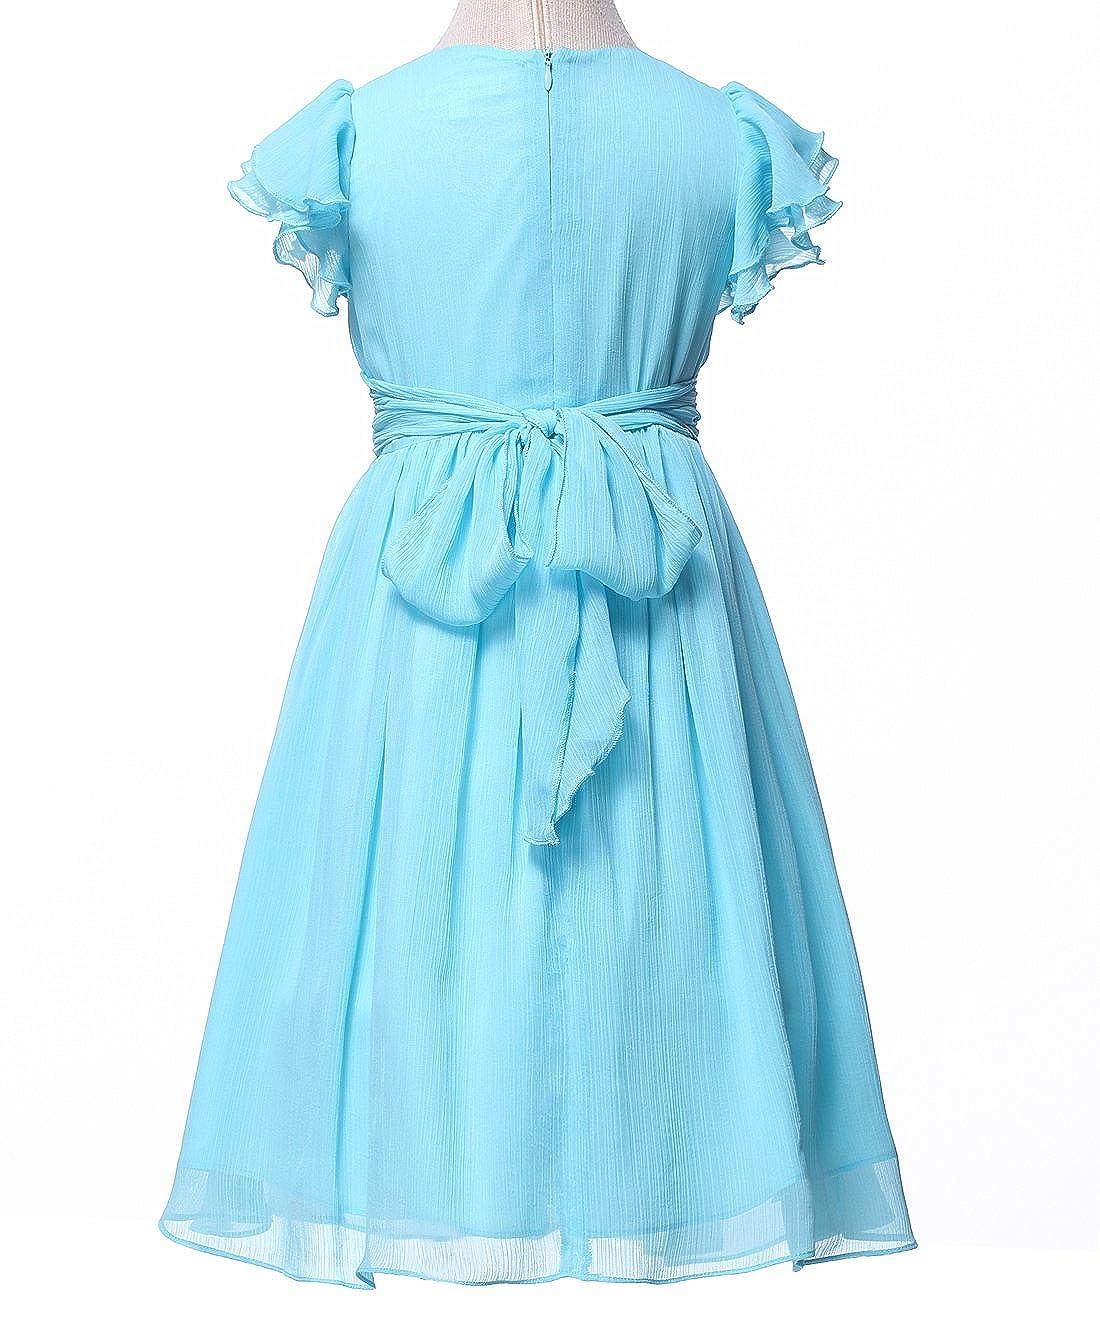 HAPPY ROSE Chiffon Prom Party Dresses Bridesmaid Dress Flower Girls Dress